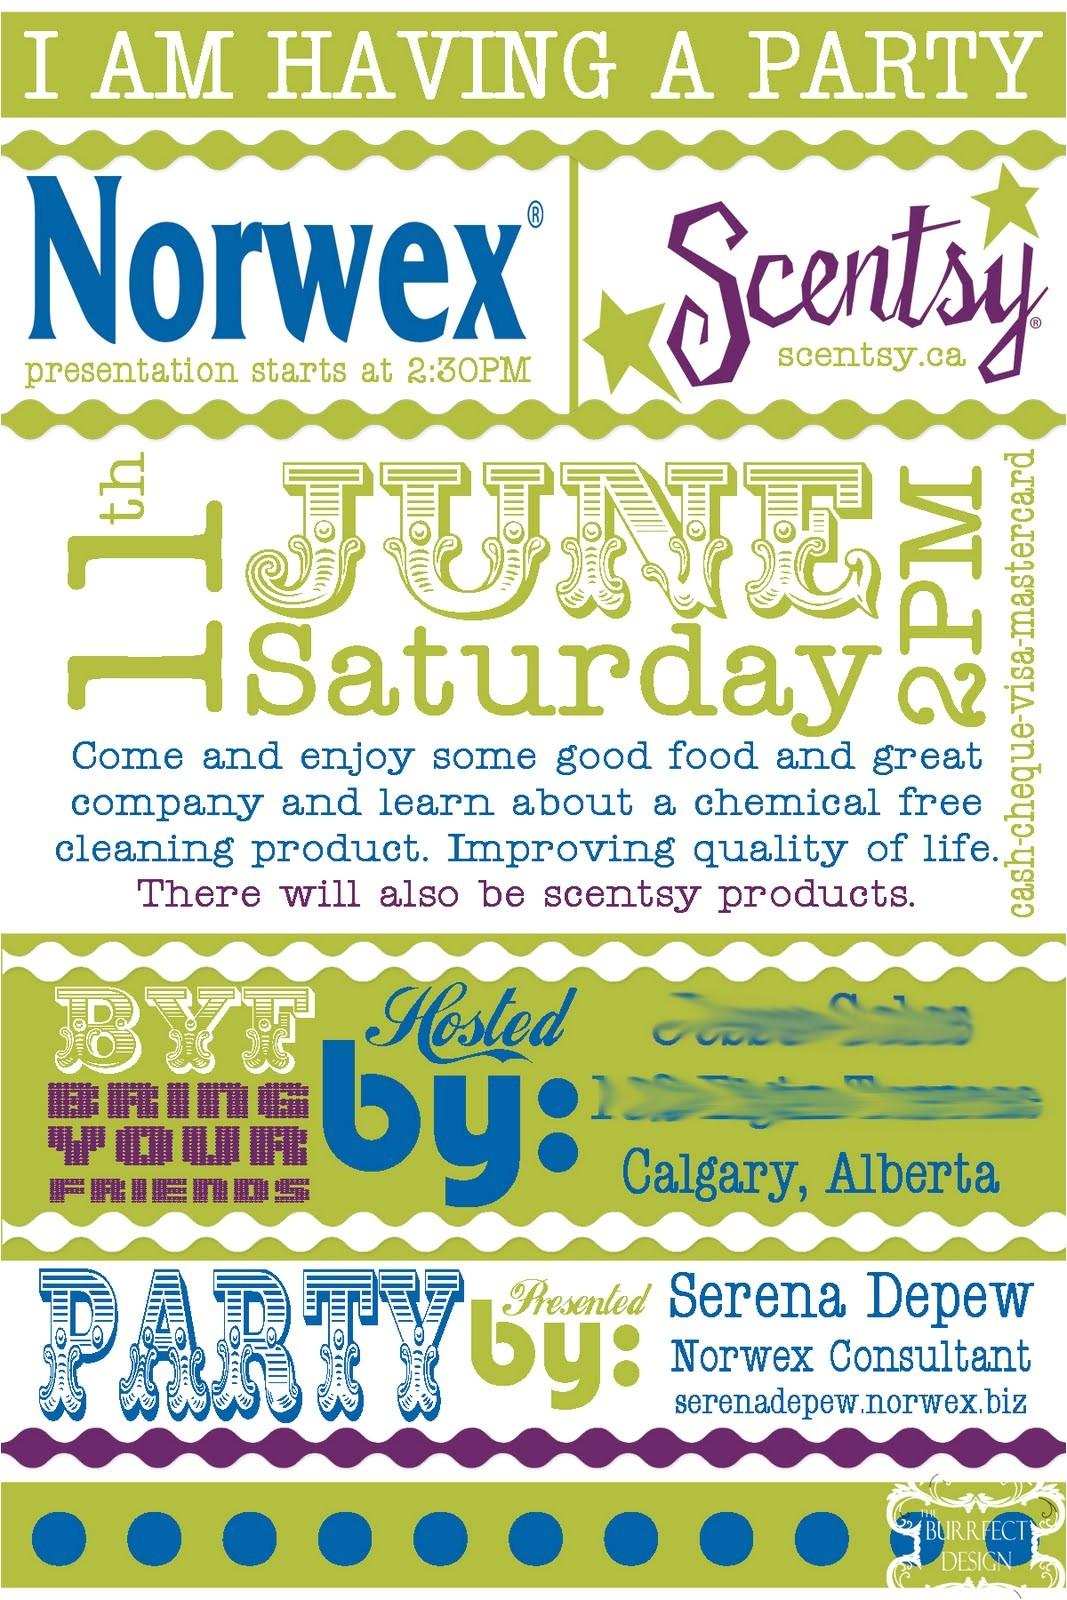 norwex invitation templates